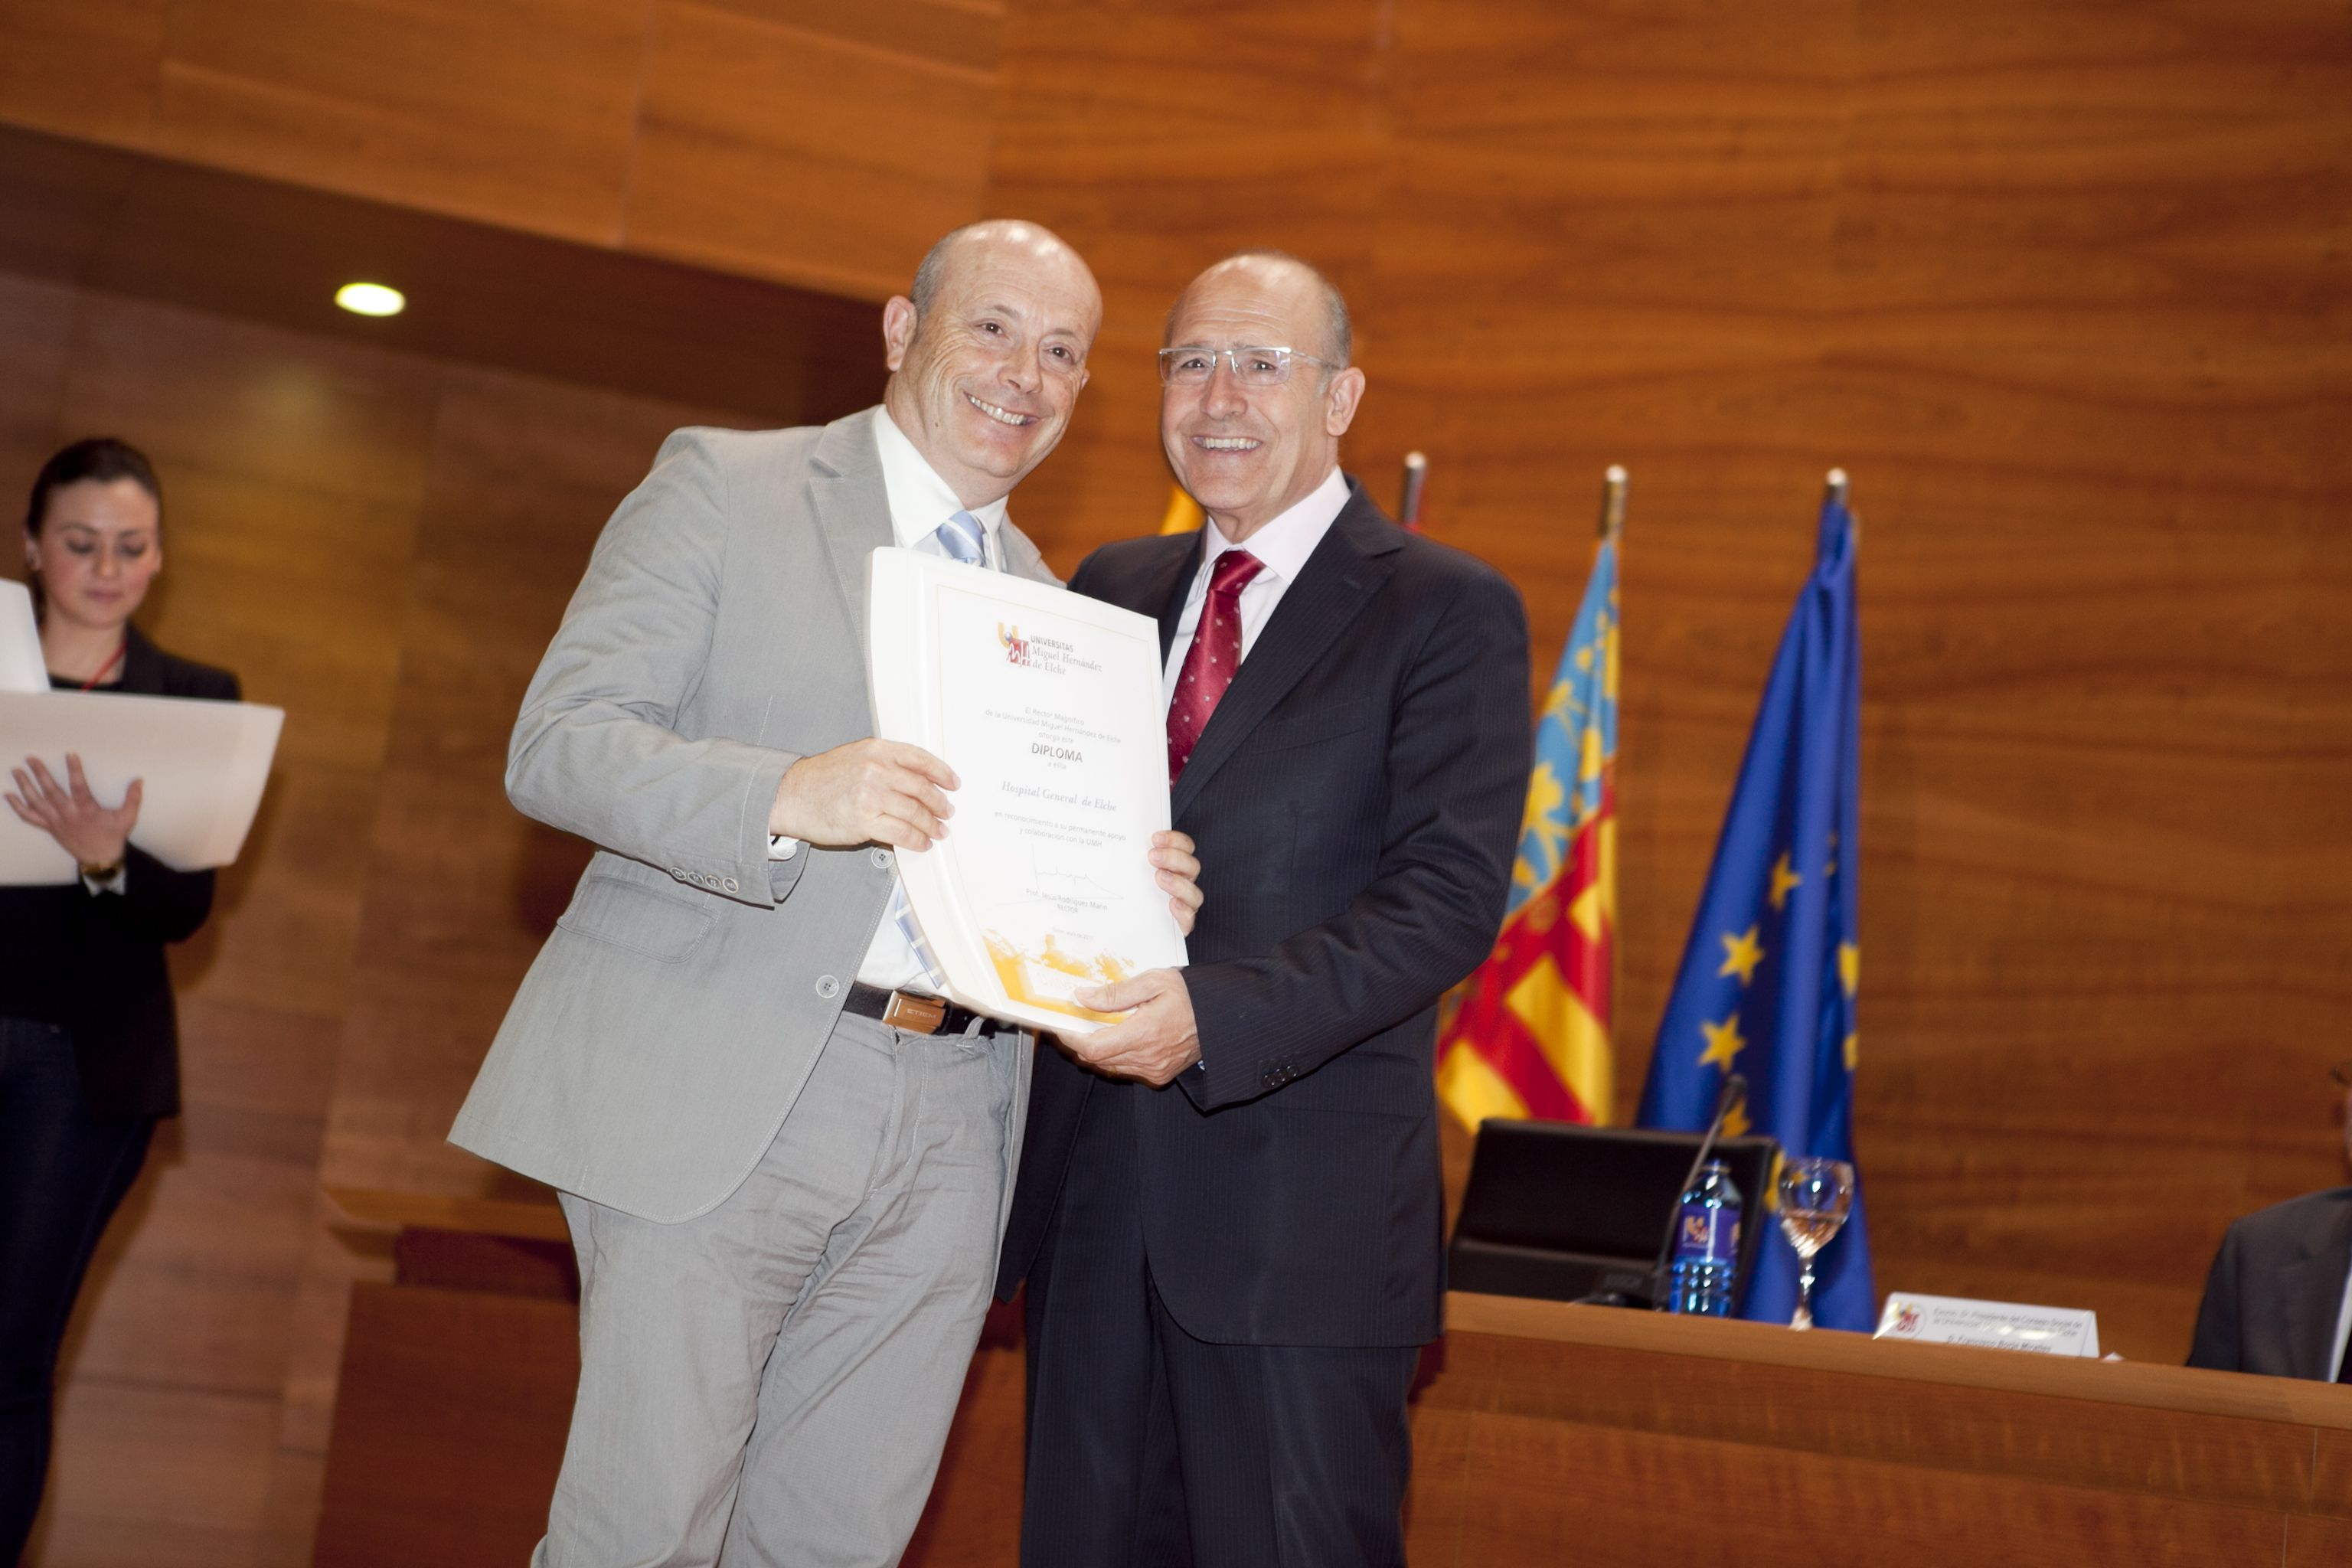 umh-diplomas-rector_mg_6967.jpg